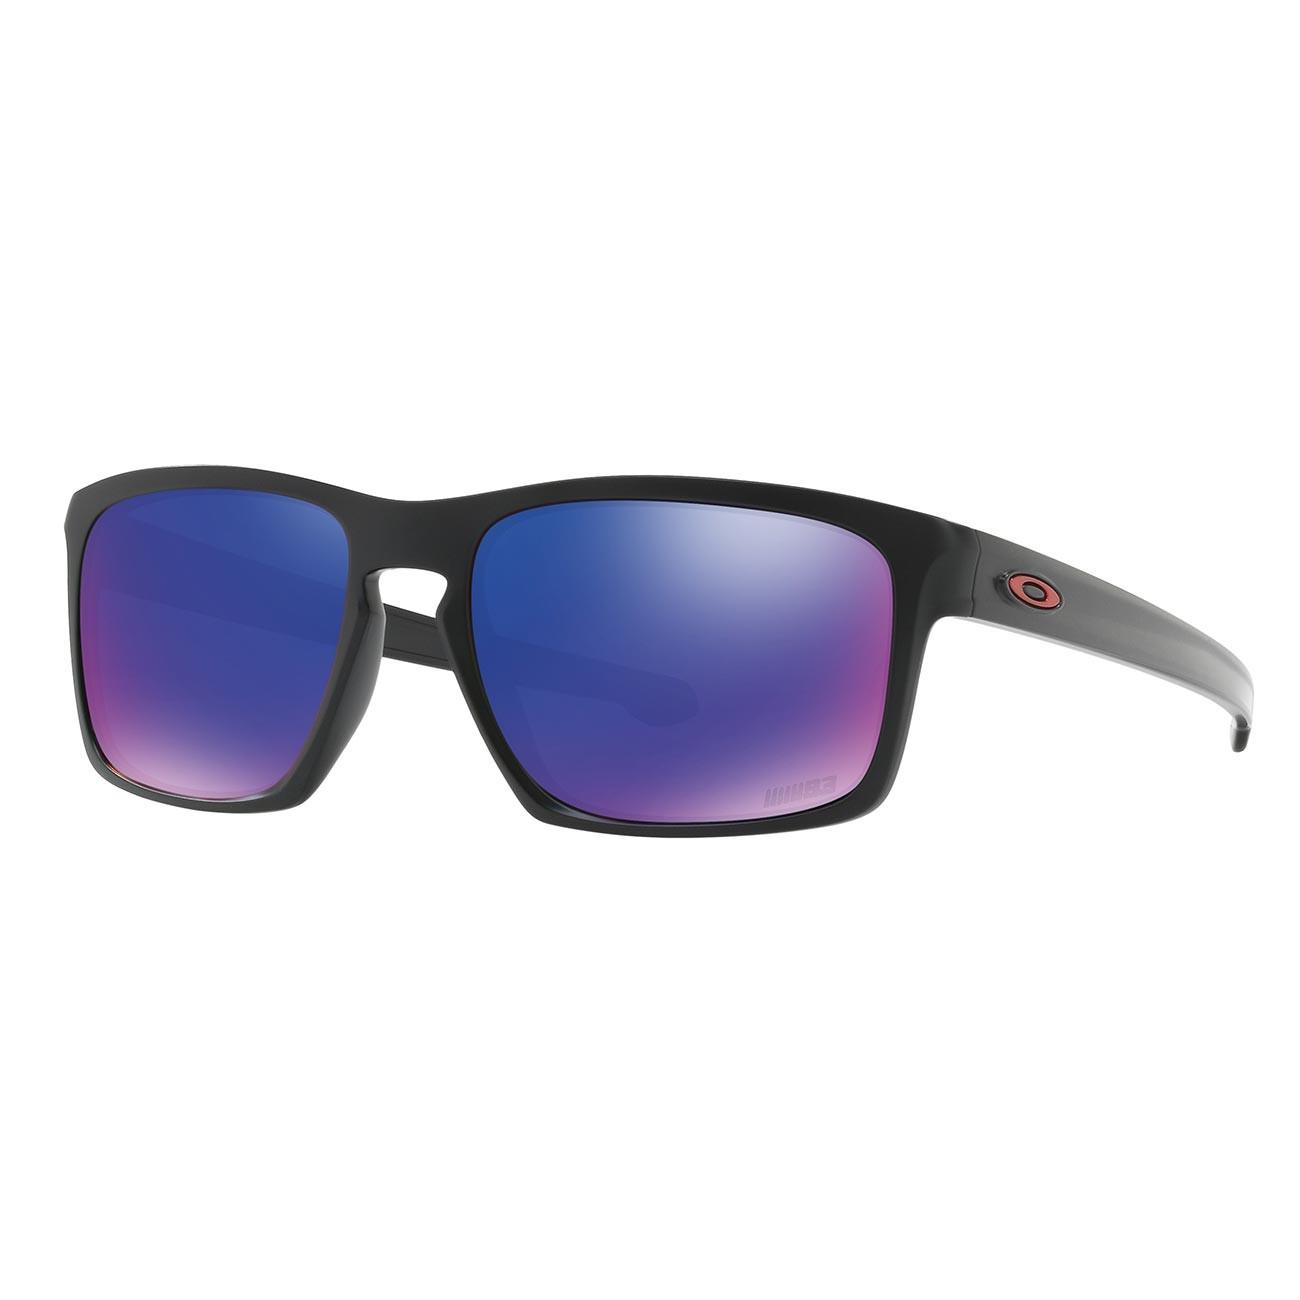 Sluneční brýle Oakley Sliver Mark Marquez matte black